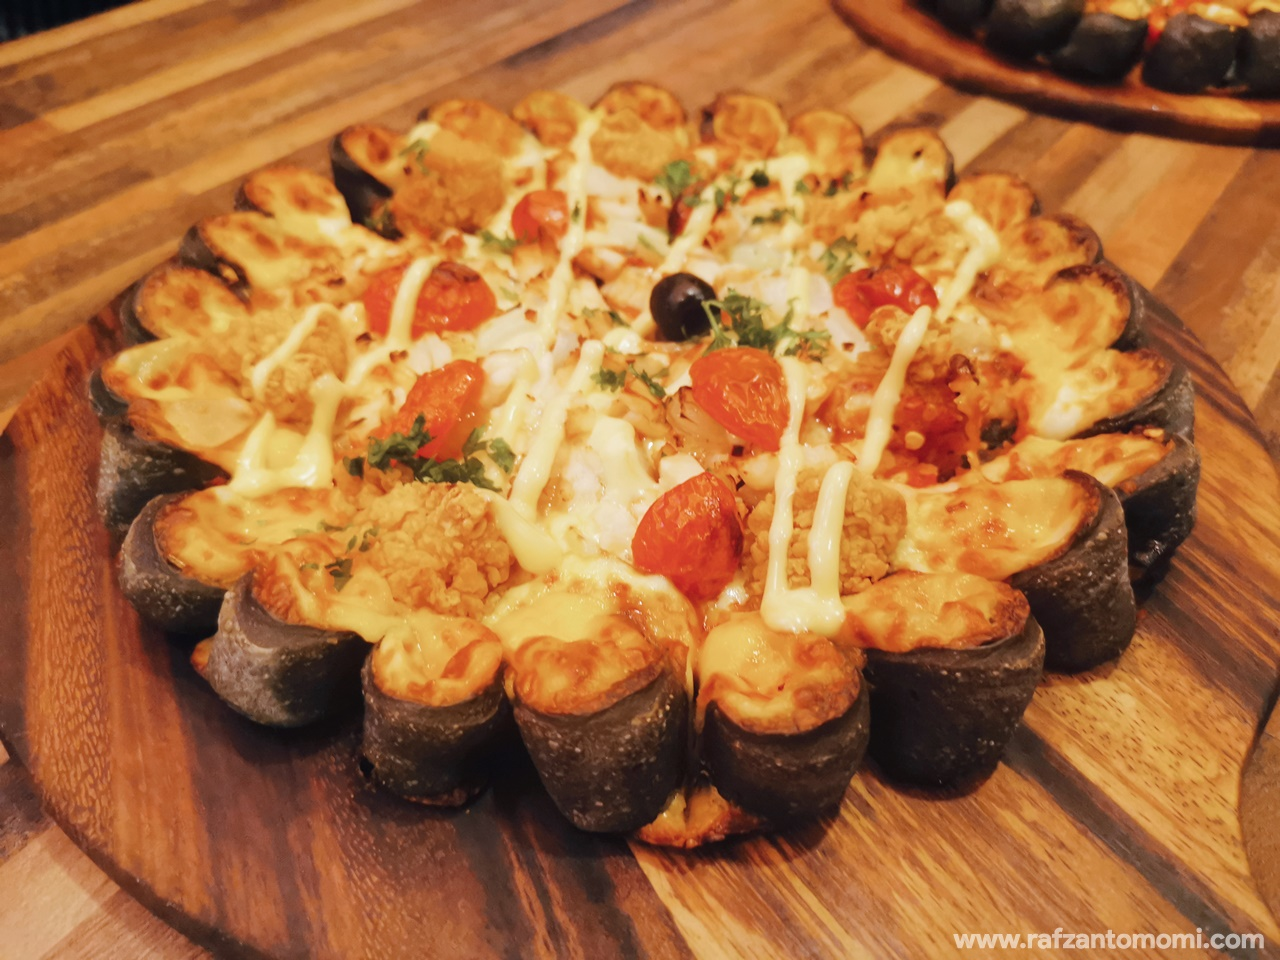 Black Volcano Pizza Bersama Cili?